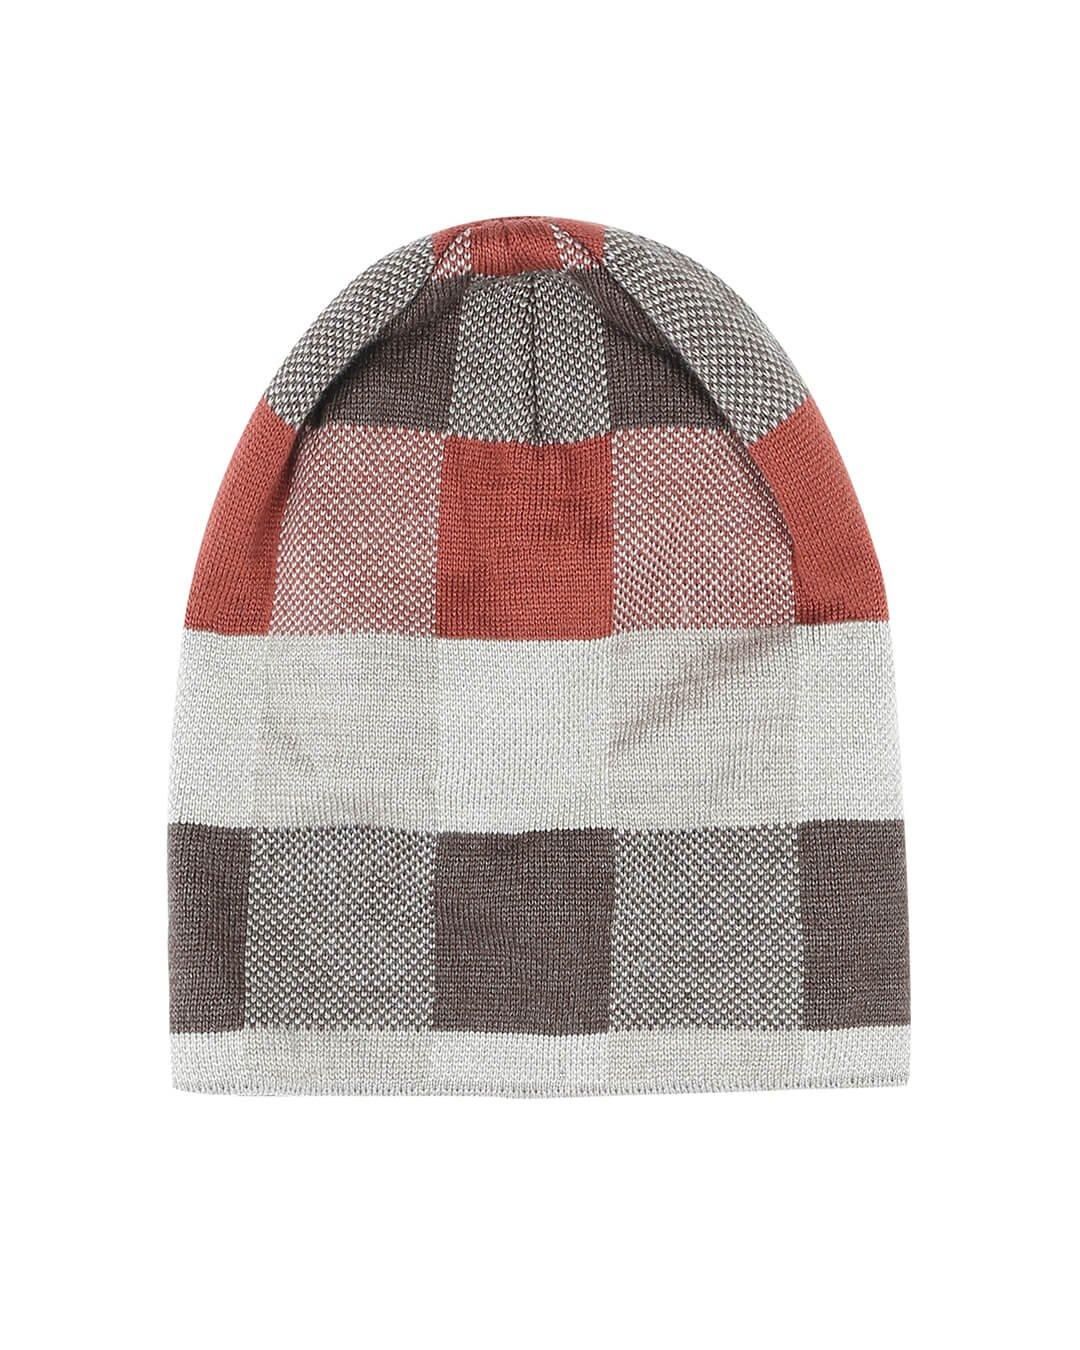 CMFW-18-58 - Desenli Bere - CMF Tekstil